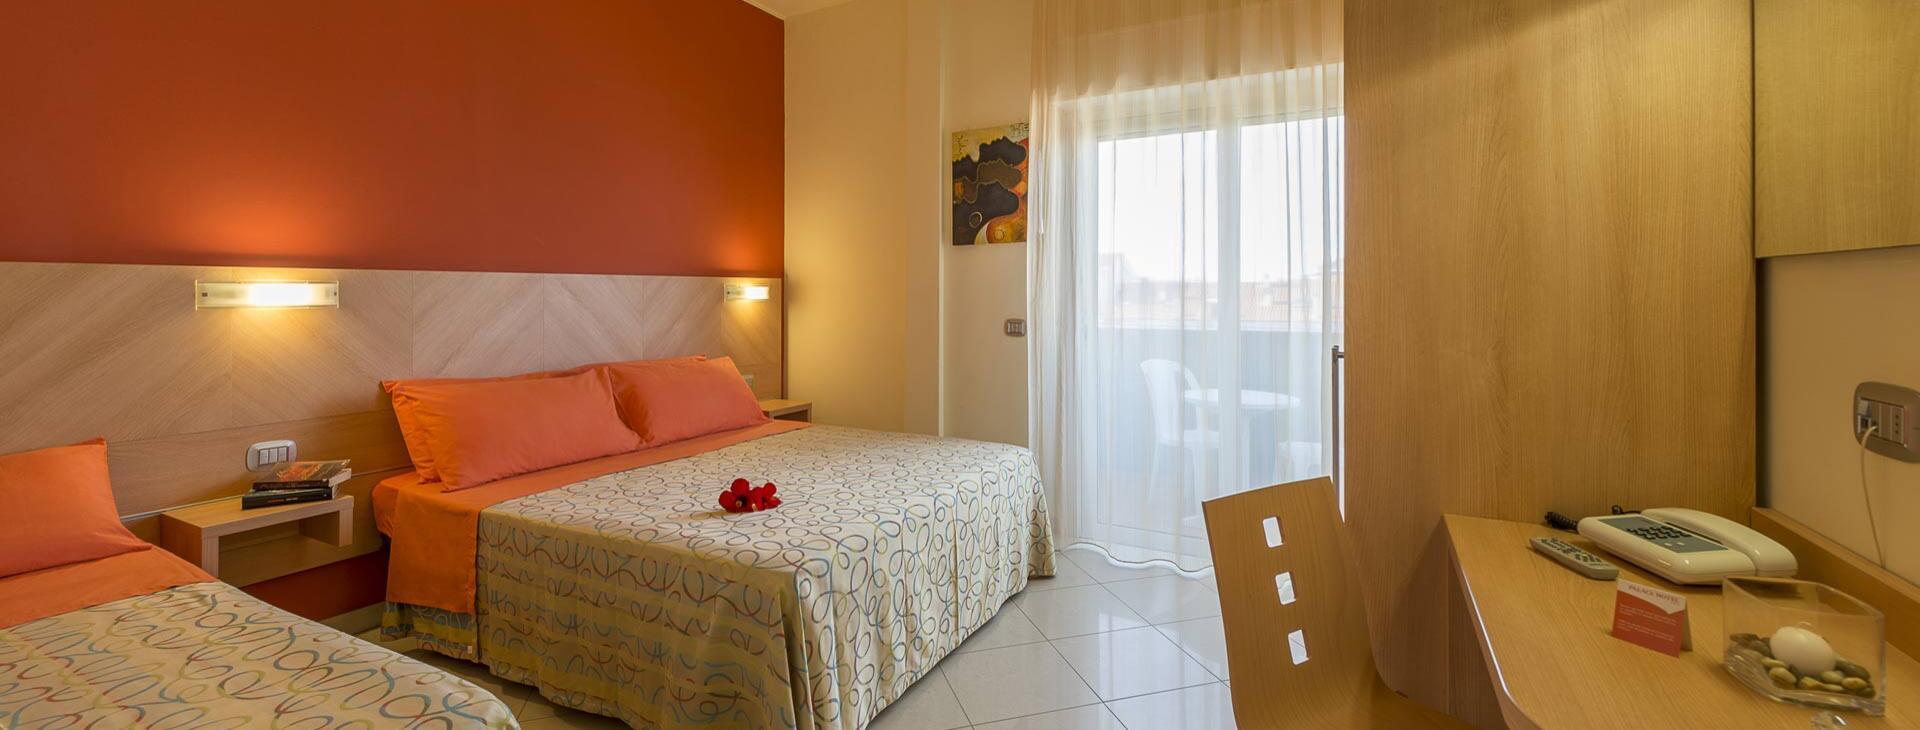 hotelpalacetortoreto it home 012